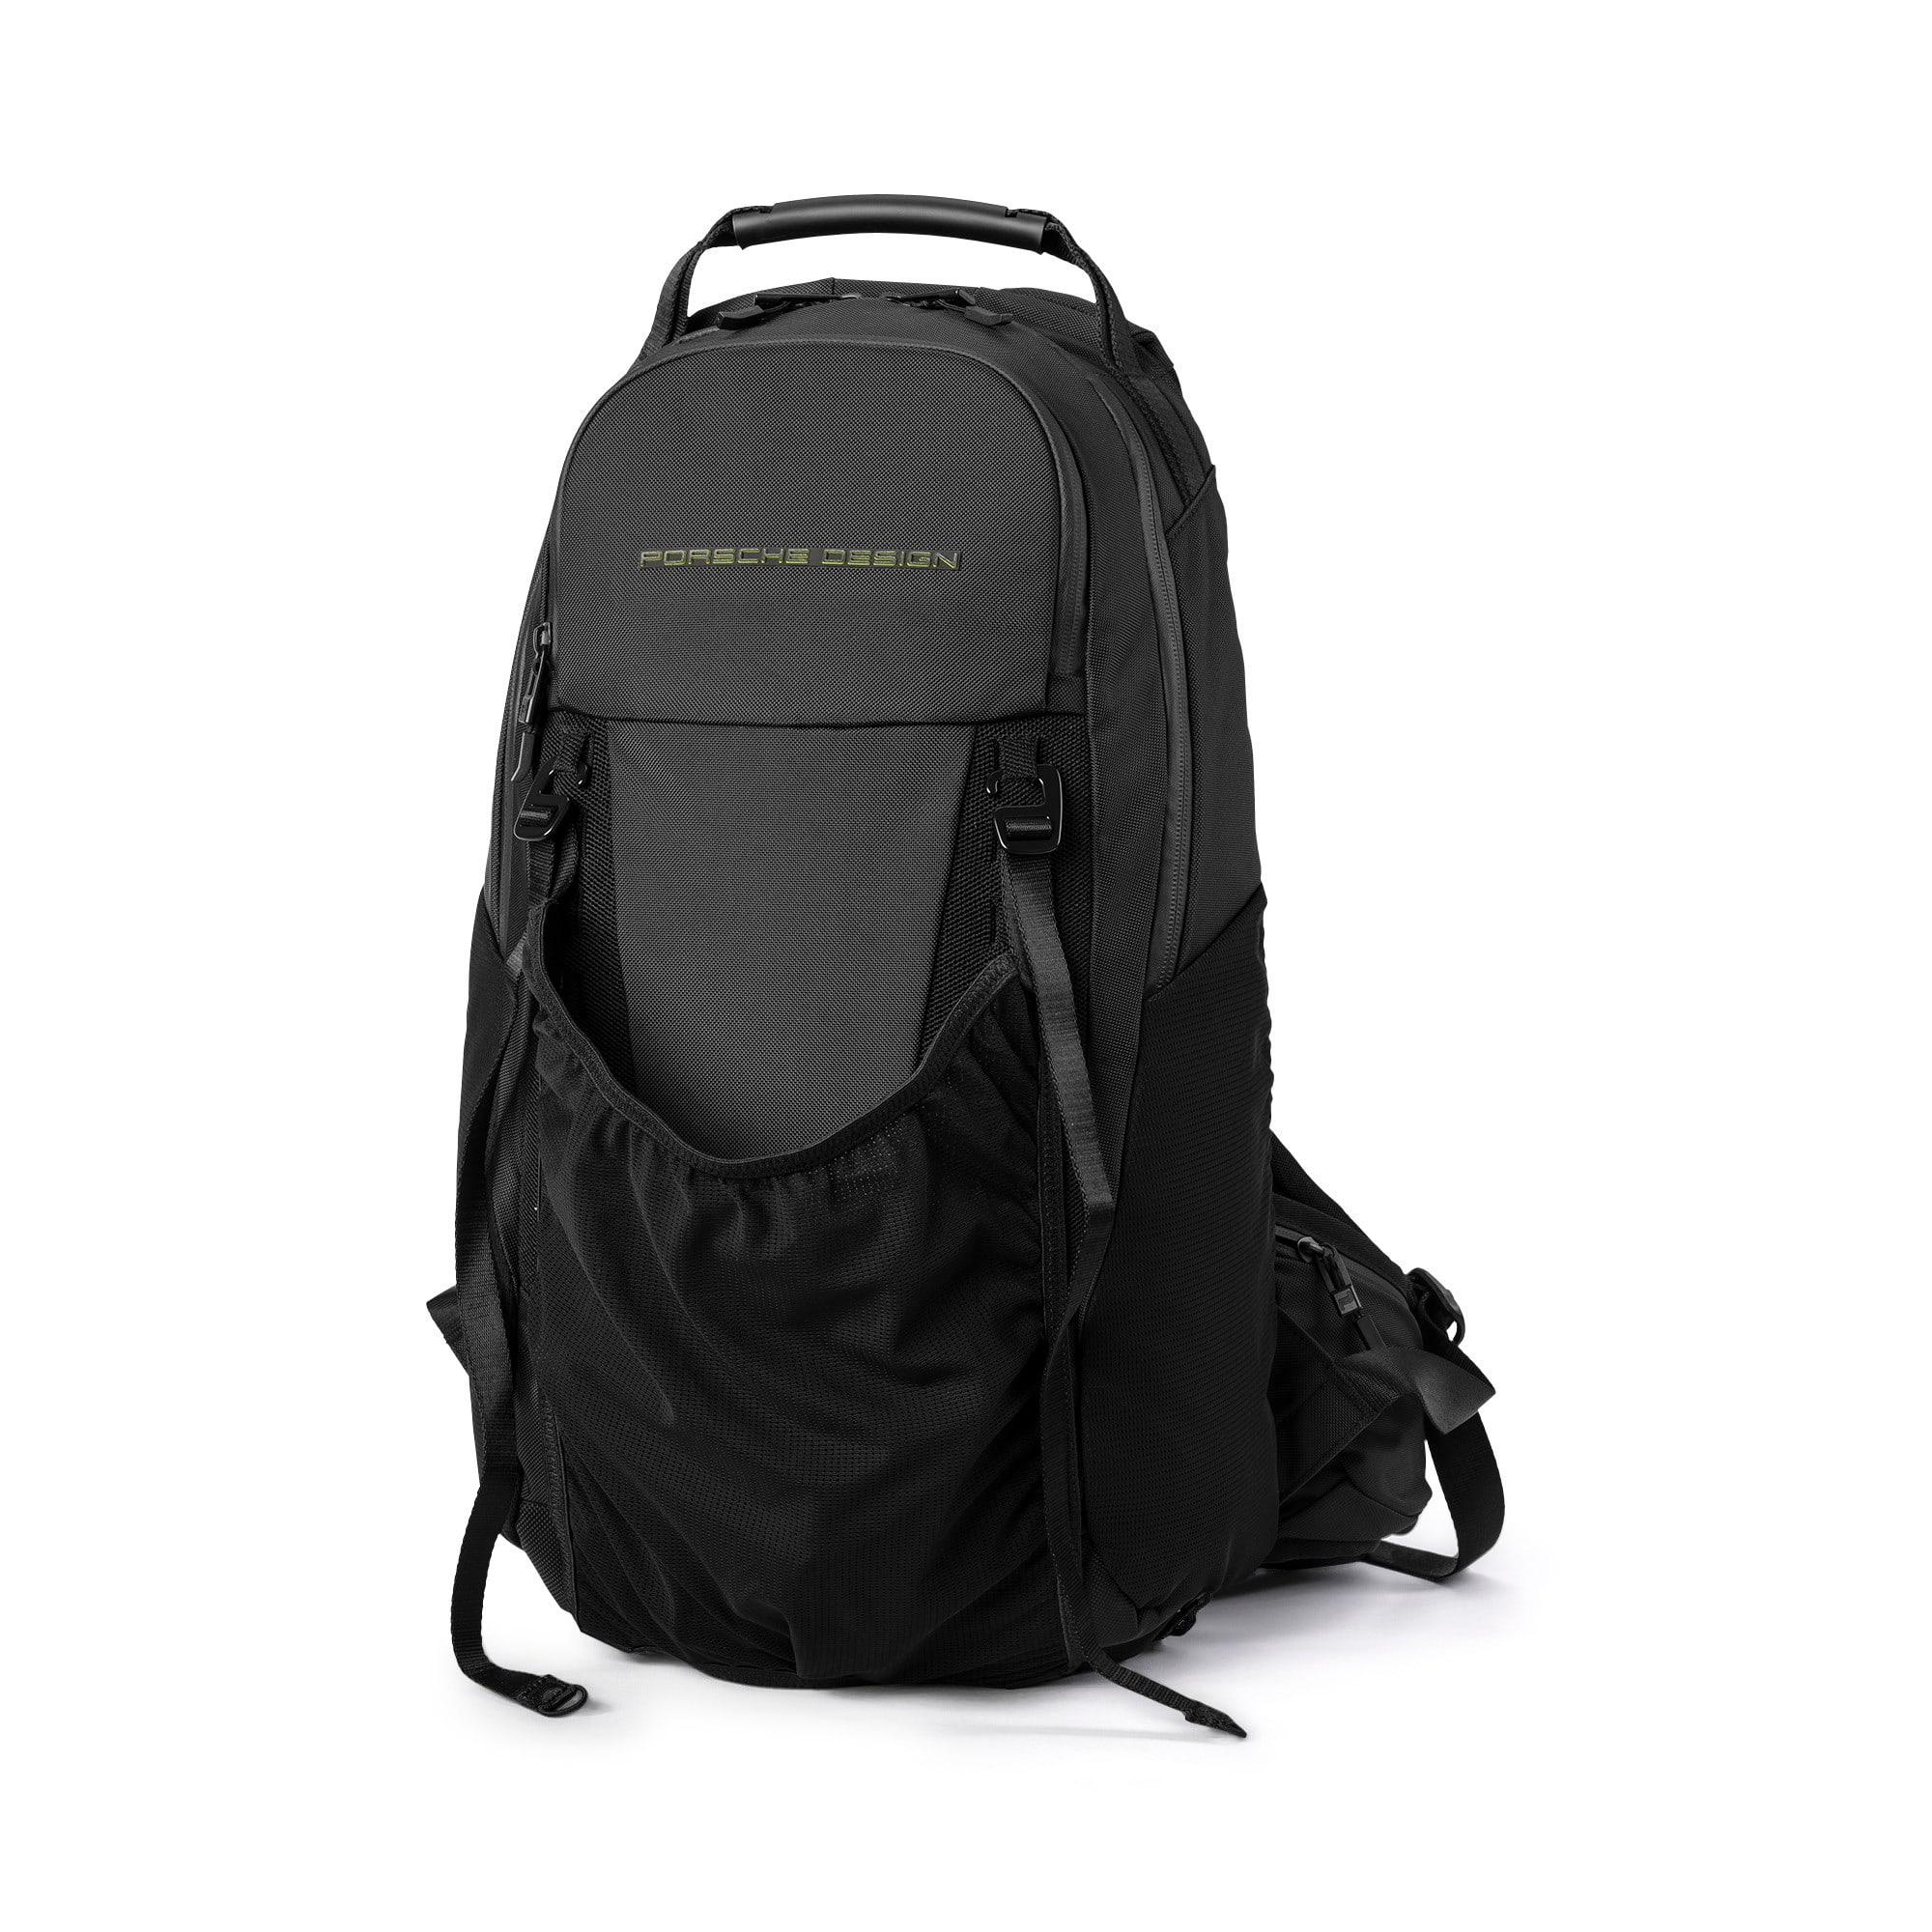 Thumbnail 5 of Porsche Design evoKNIT Backpack, Puma Black, medium